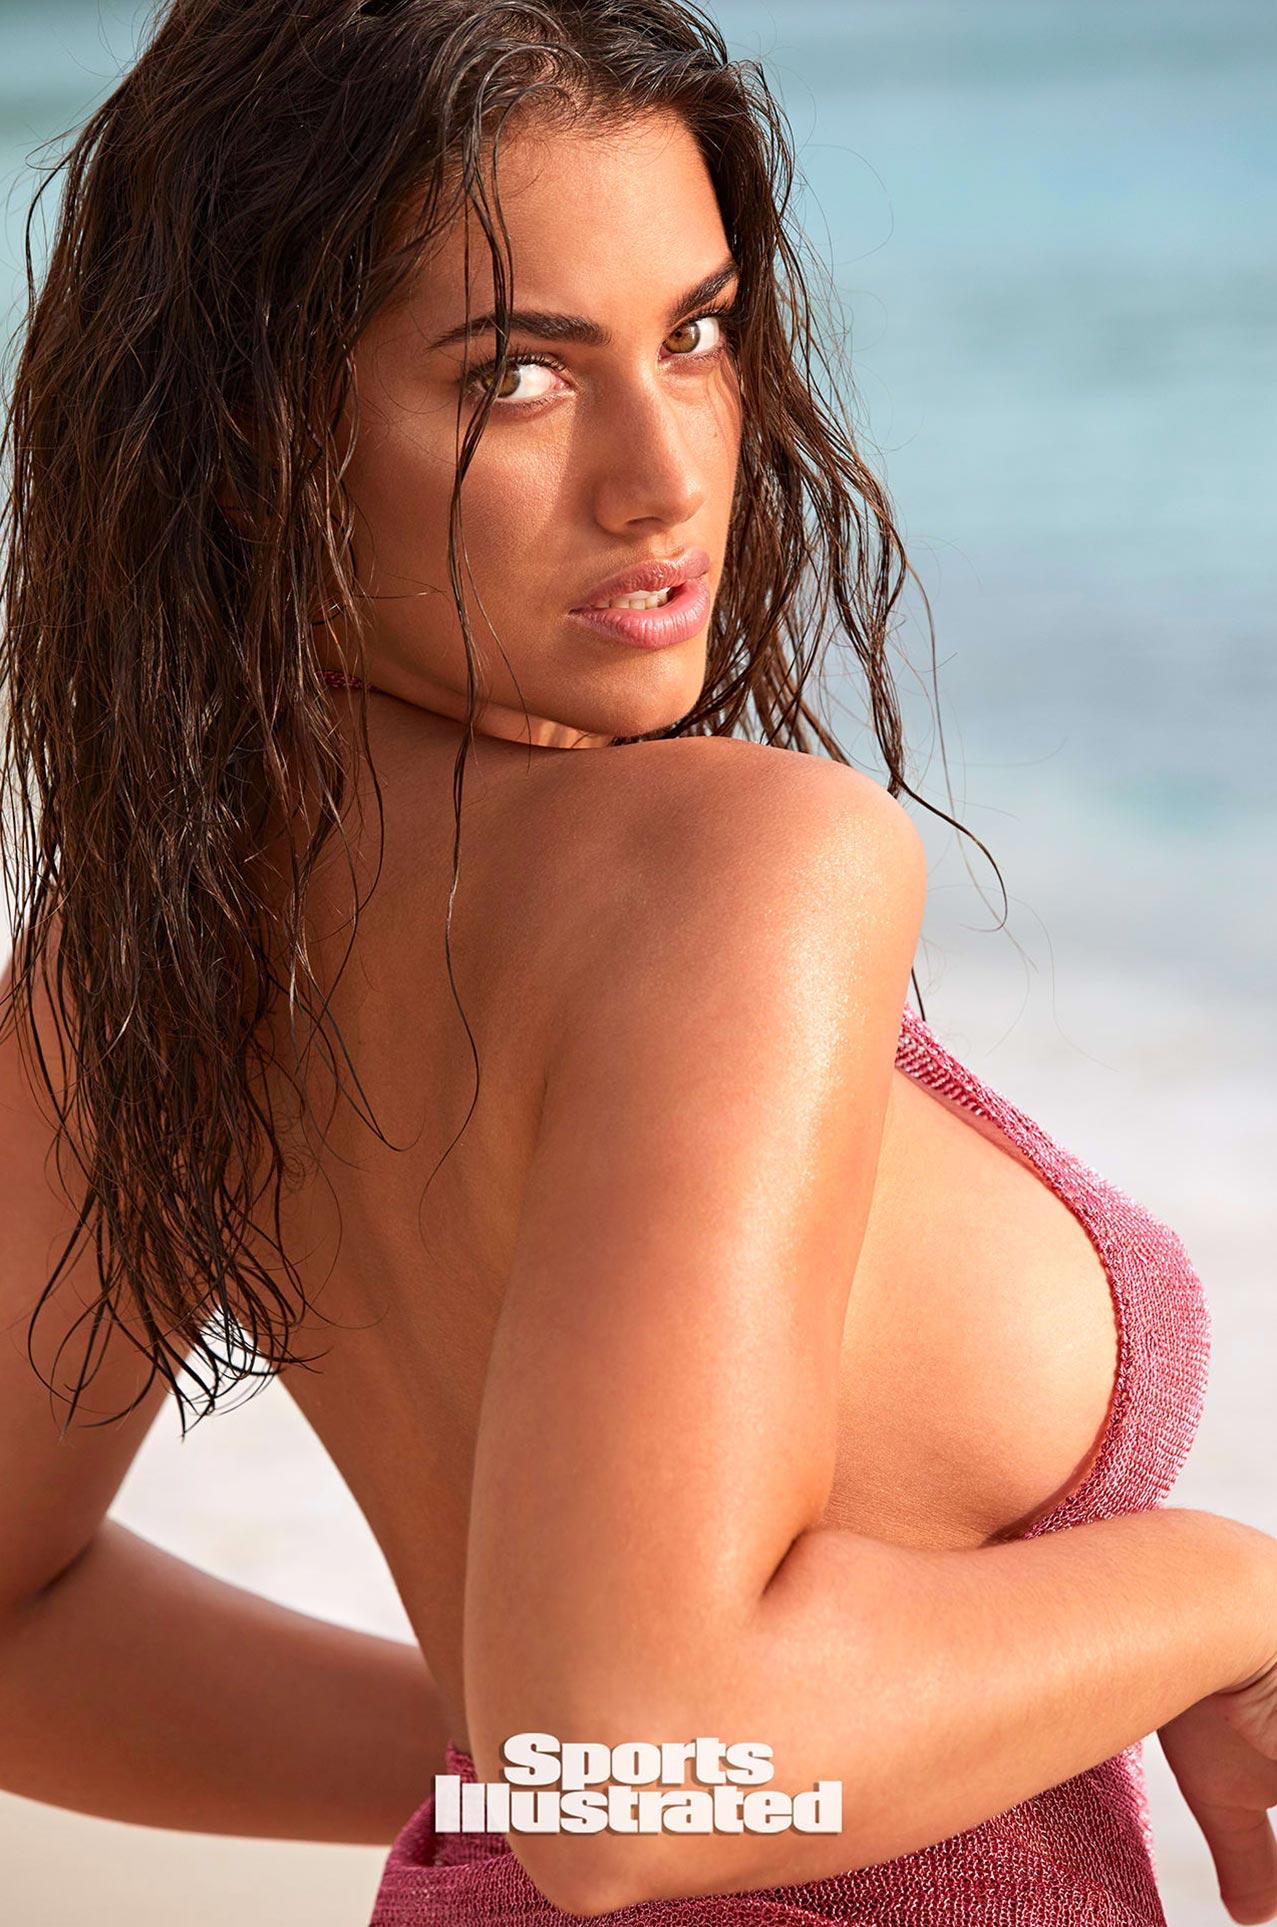 Лорена Дюран в каталоге купальников Sports Illustrated Swimsuit 2020 / фото 06